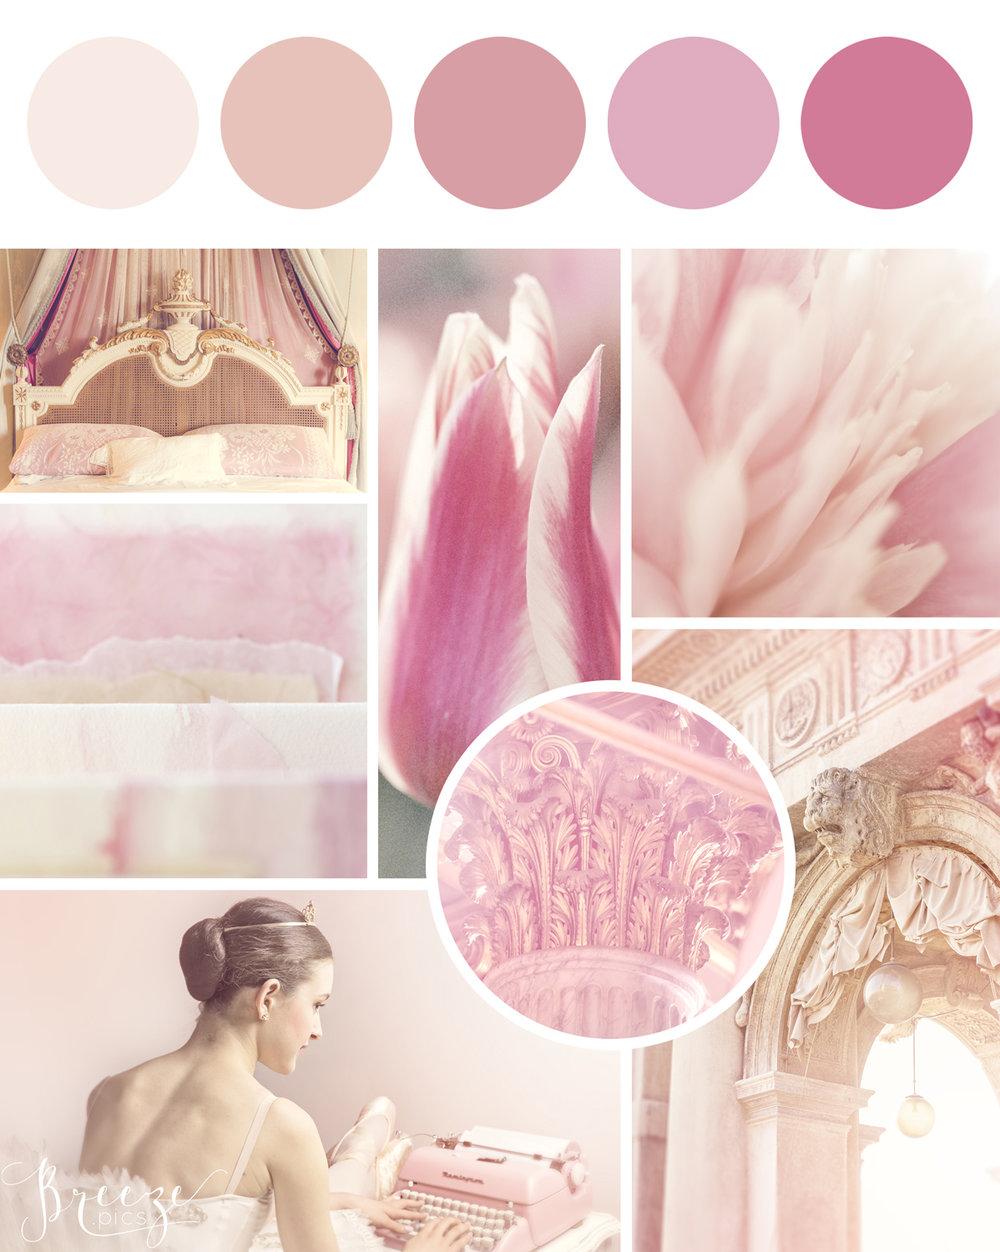 Pink mood board, creating a sanctuary at home, Breeze Pics